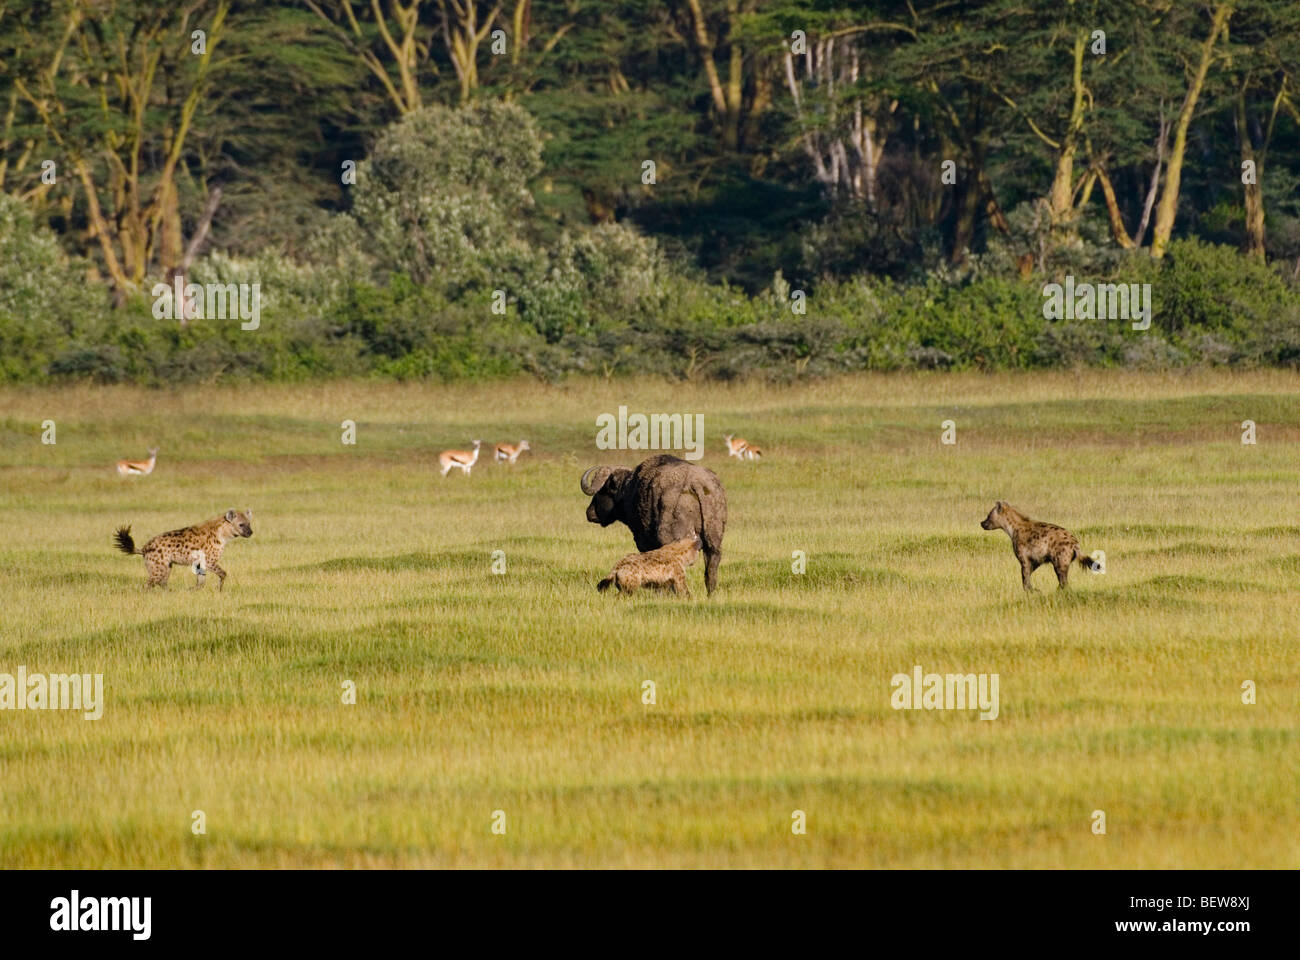 Cape buffalo (Syncerus caffer) surrounded by Spotted Hyenas (Crocuta crocuta), Lake Nakuru National Park, Kenya Stock Photo